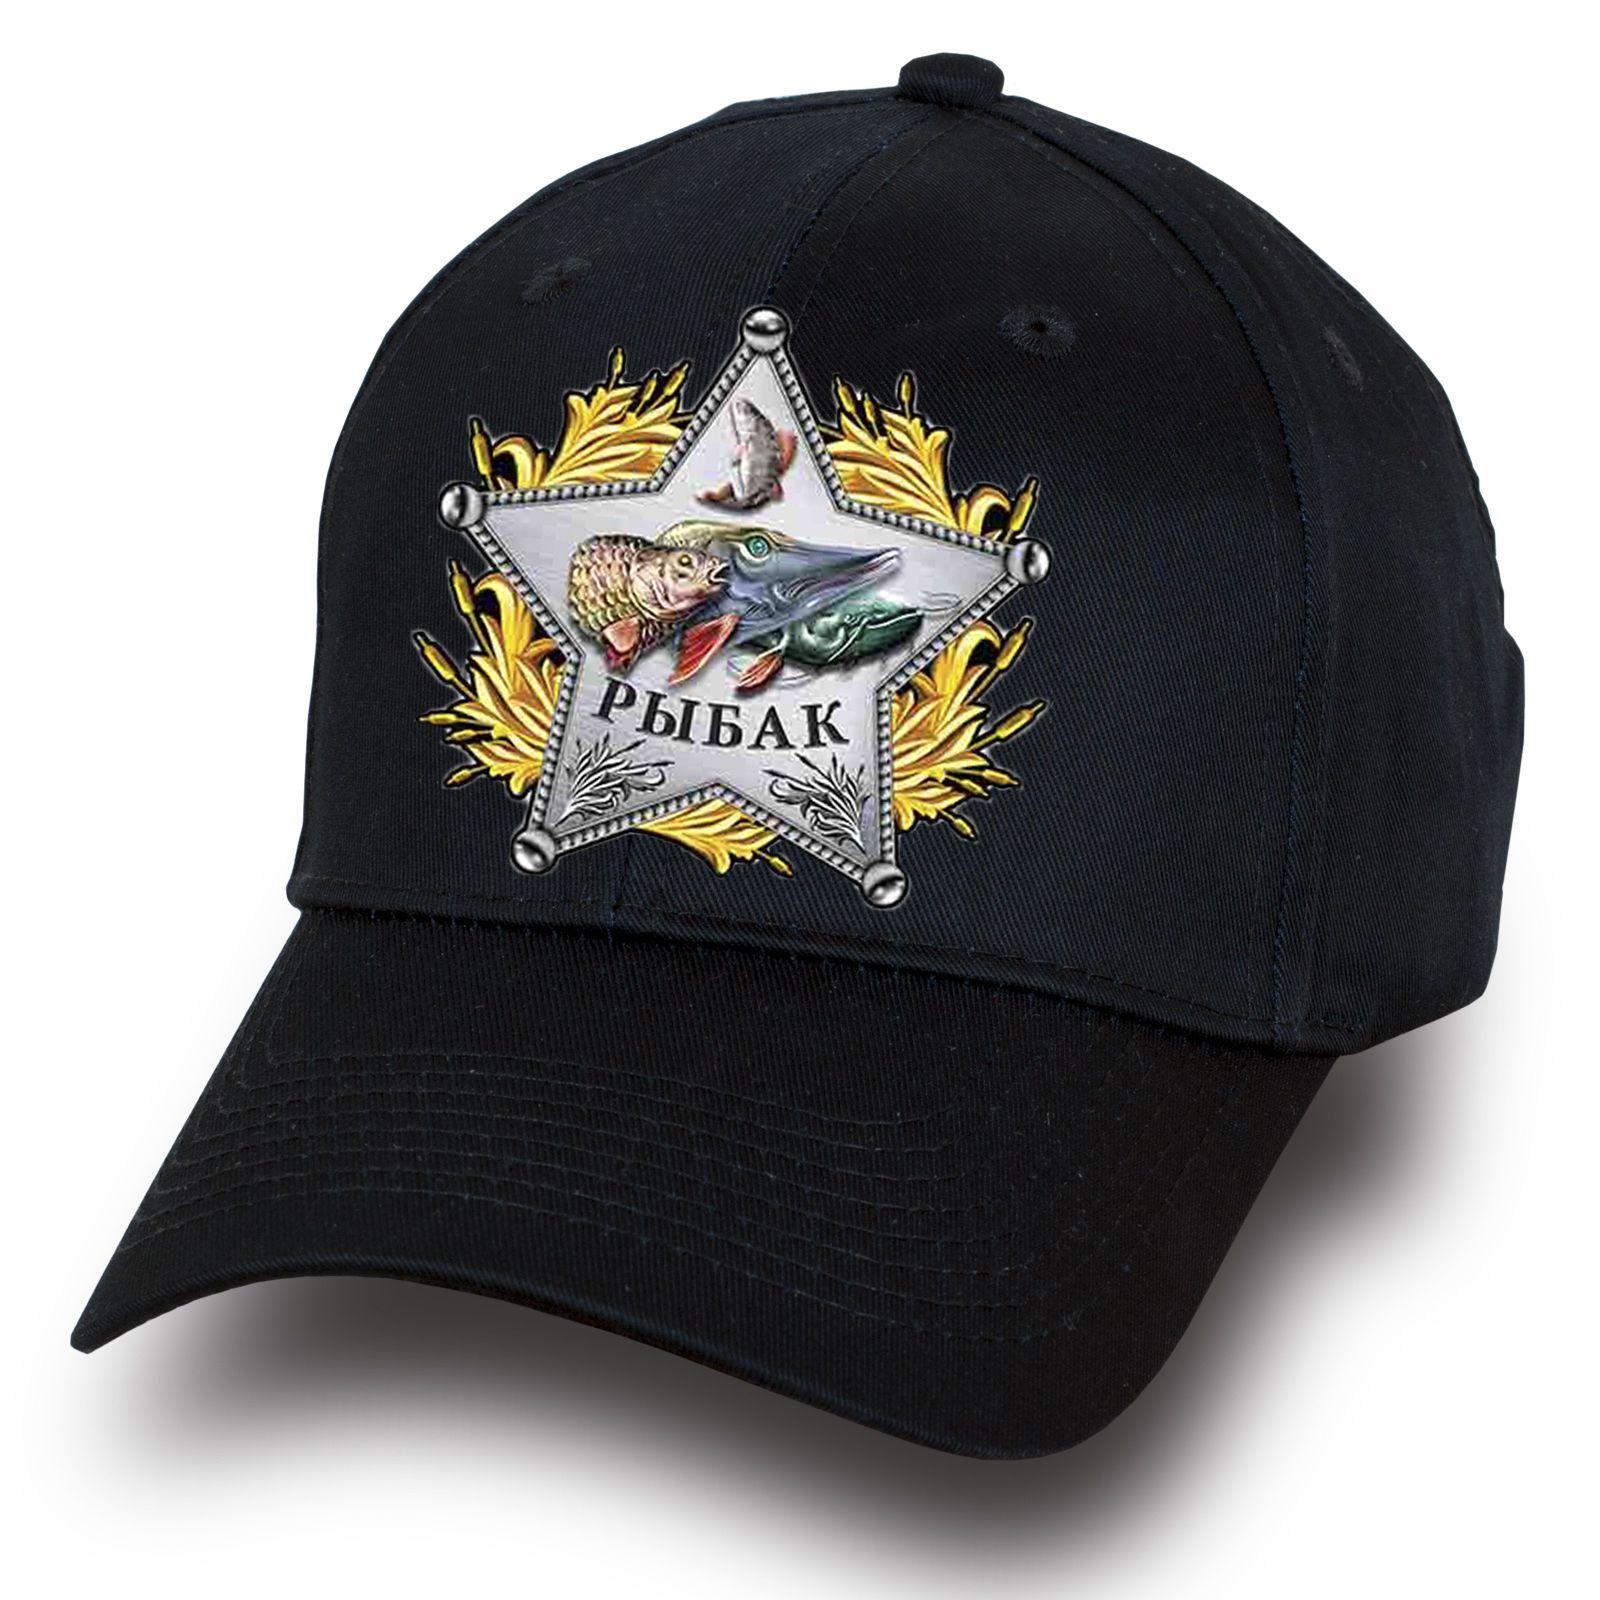 Кепка Настоящего рыбака - заказать онлайн